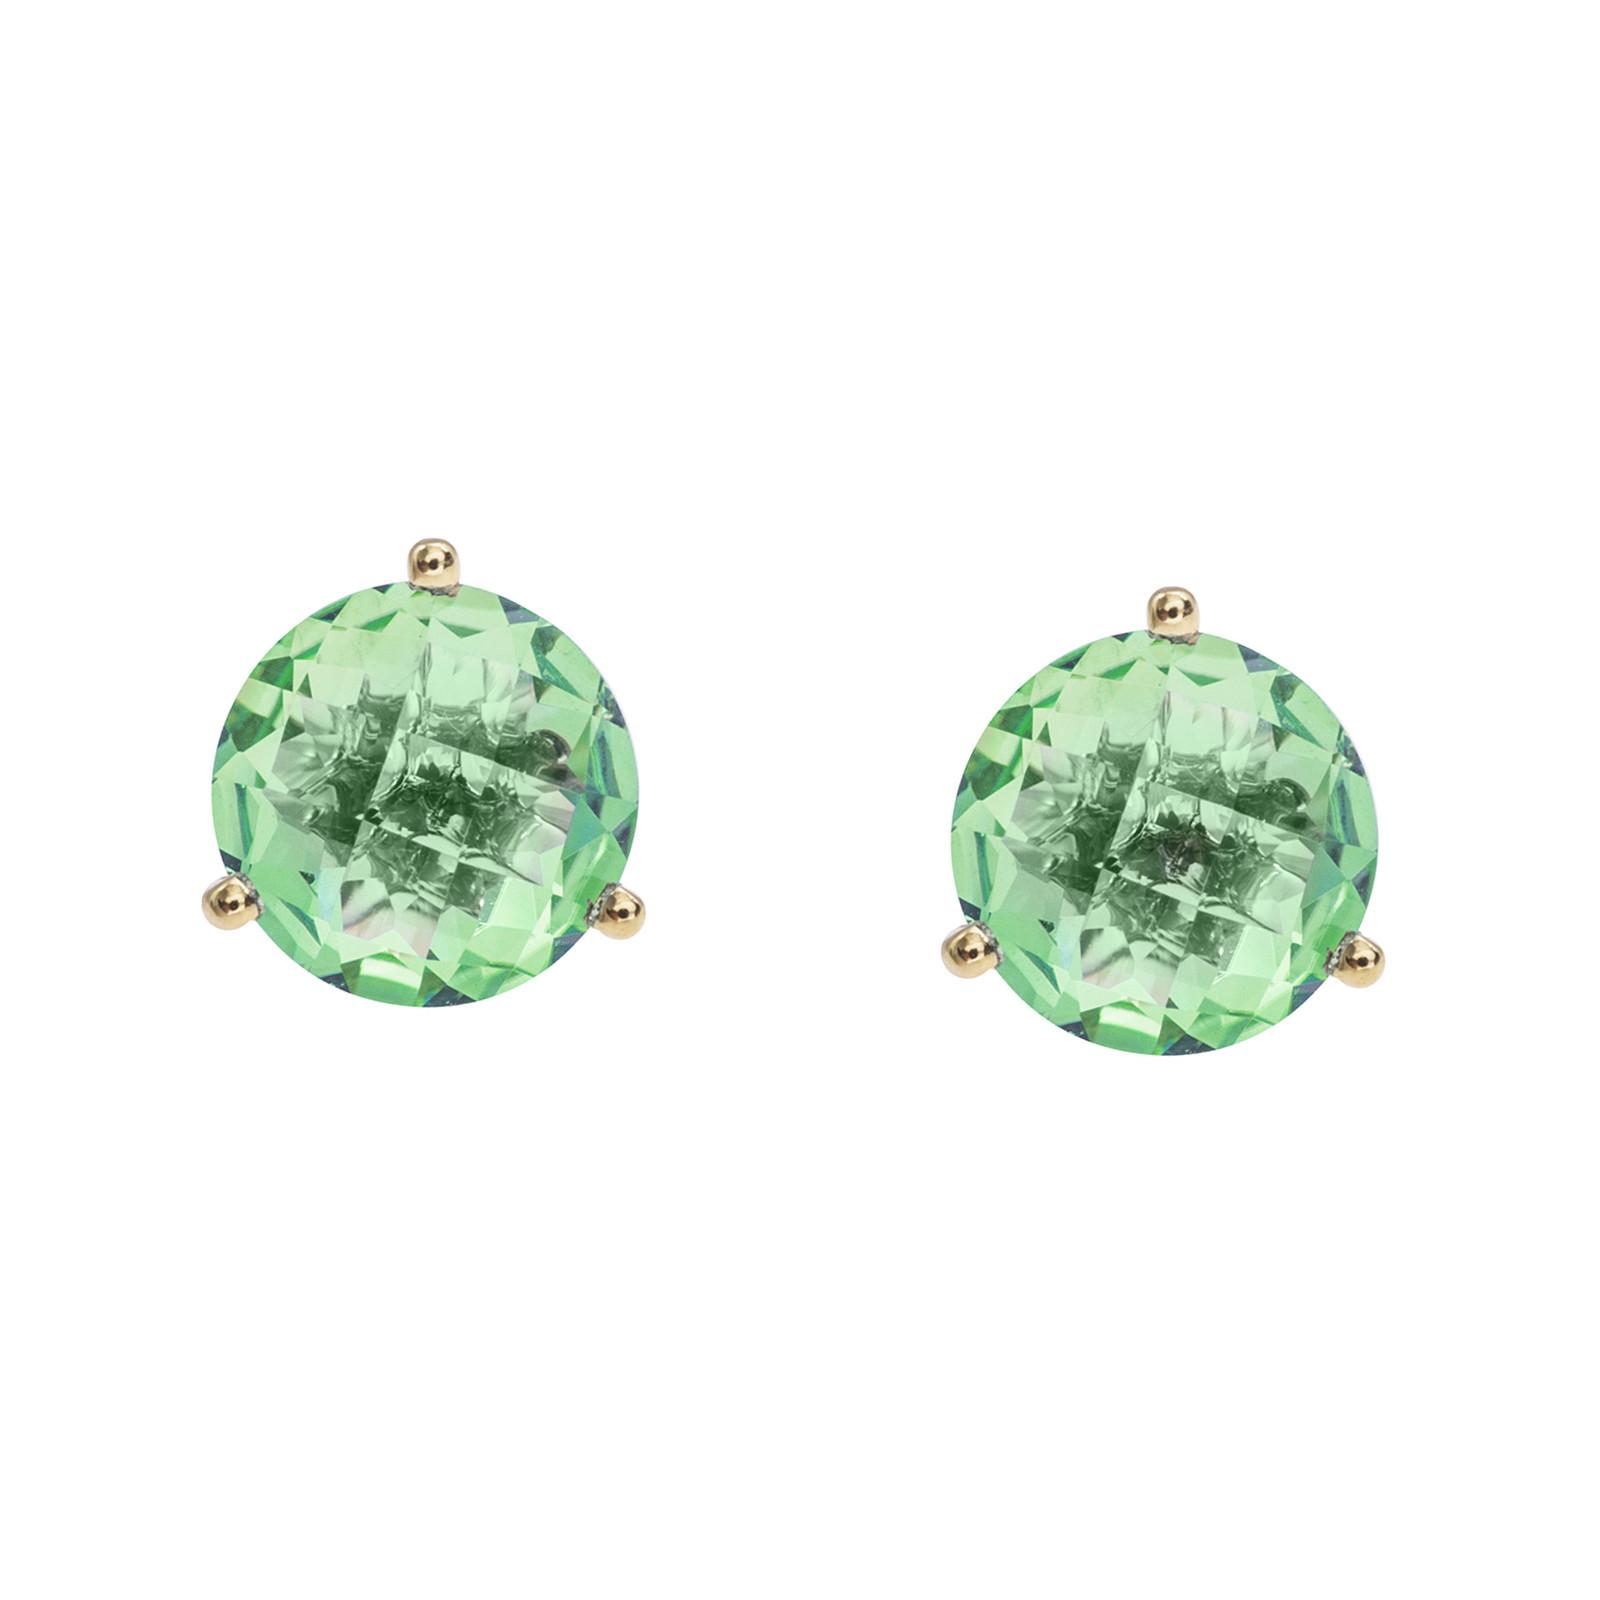 New 3.88 CTW Peridot Stud Earrings